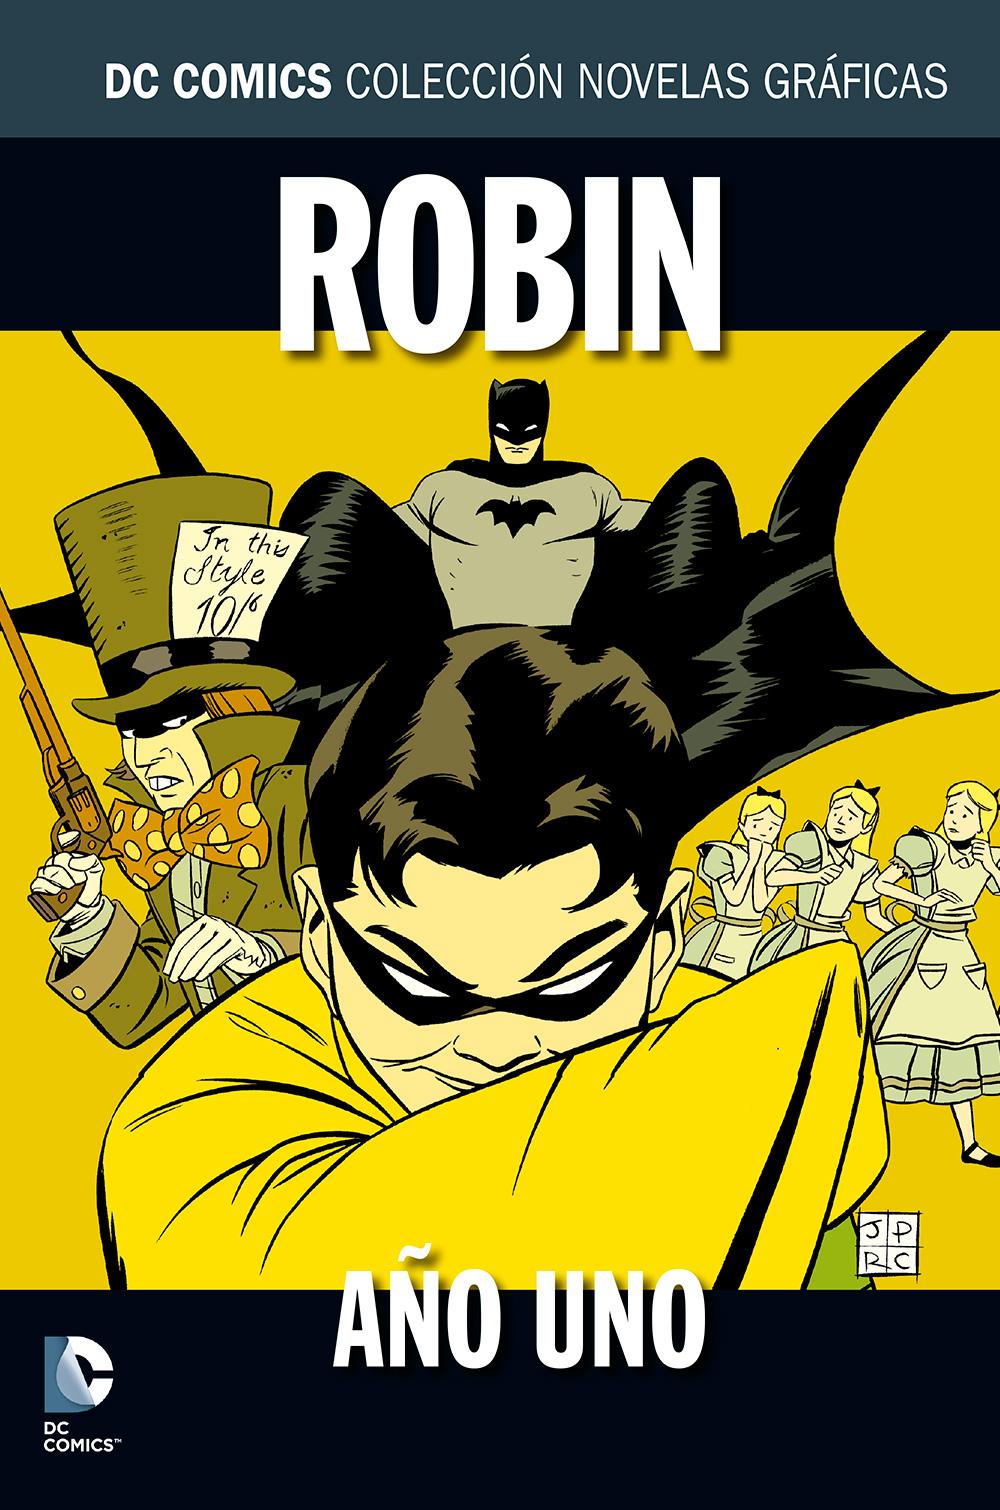 836 - [DC - Salvat] La Colección de Novelas Gráficas de DC Comics  SF118_023_01_001